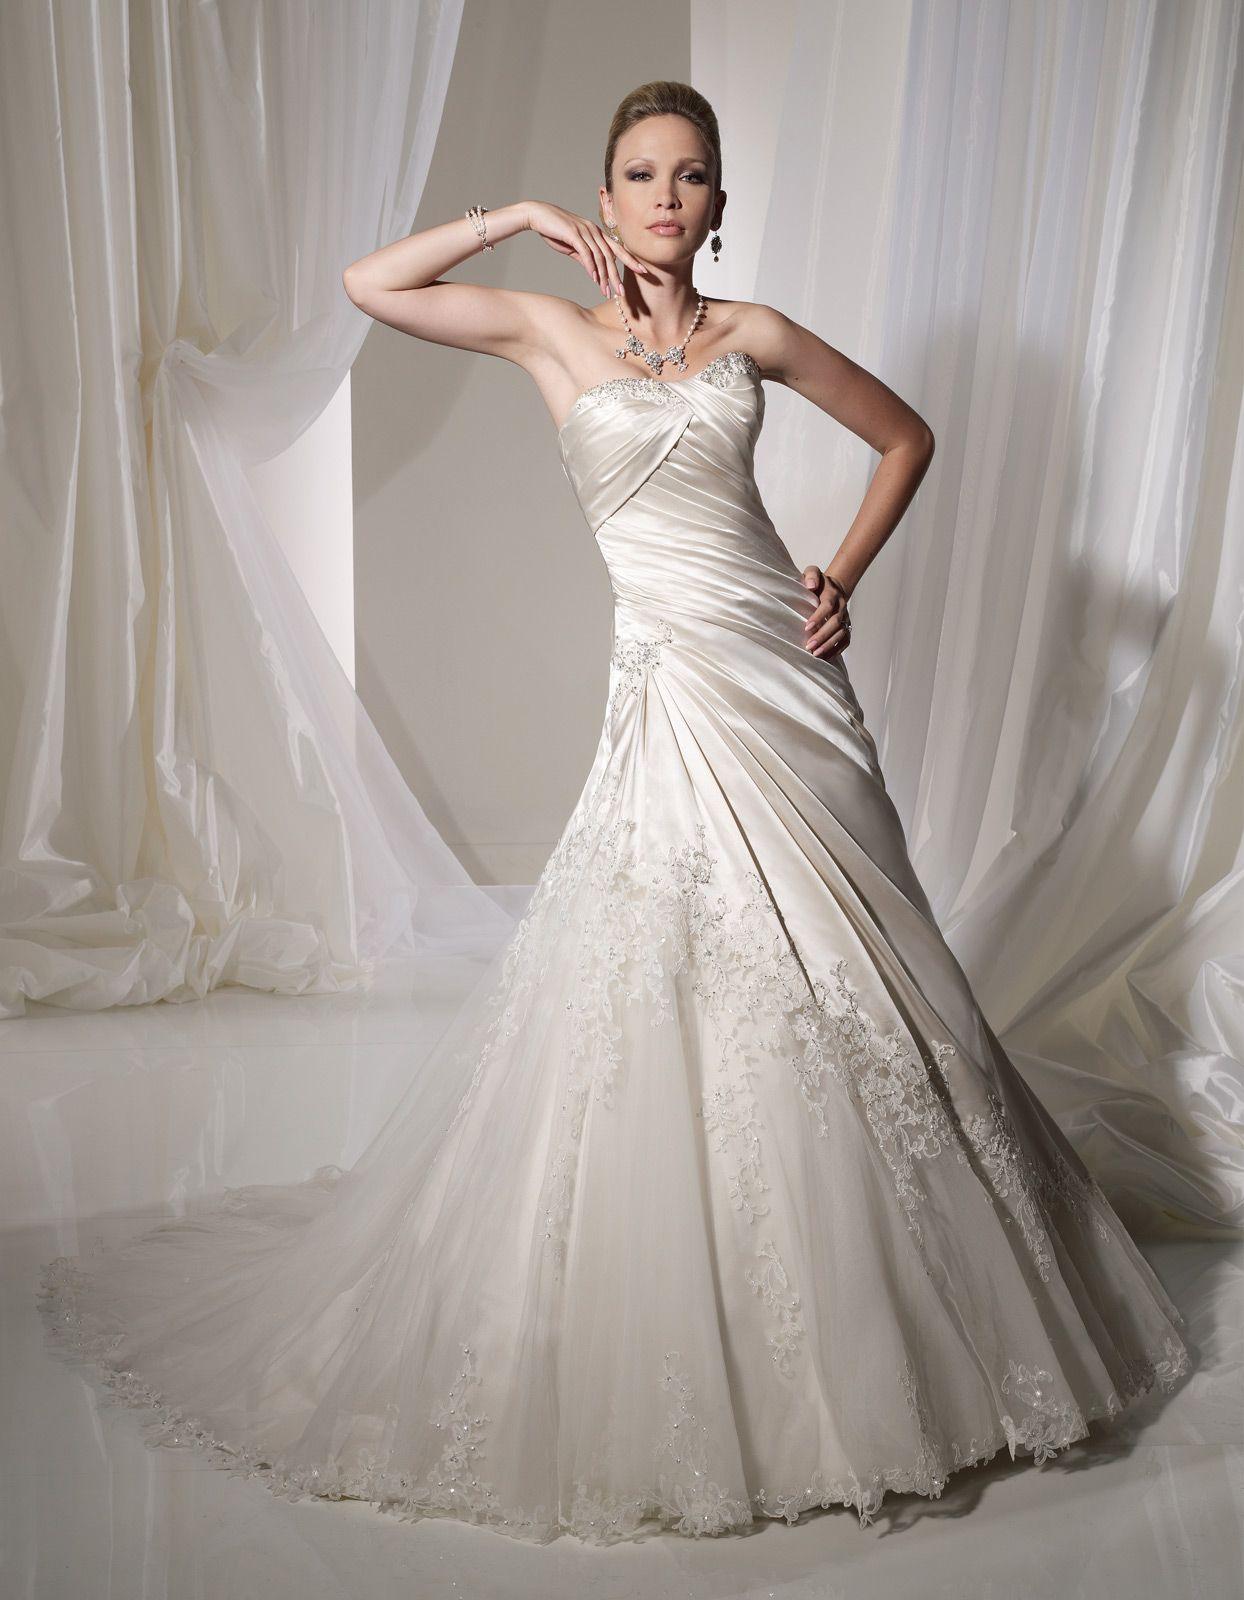 Asymmetrical Wedding Dress Strapless Court Train Satin Netting ...